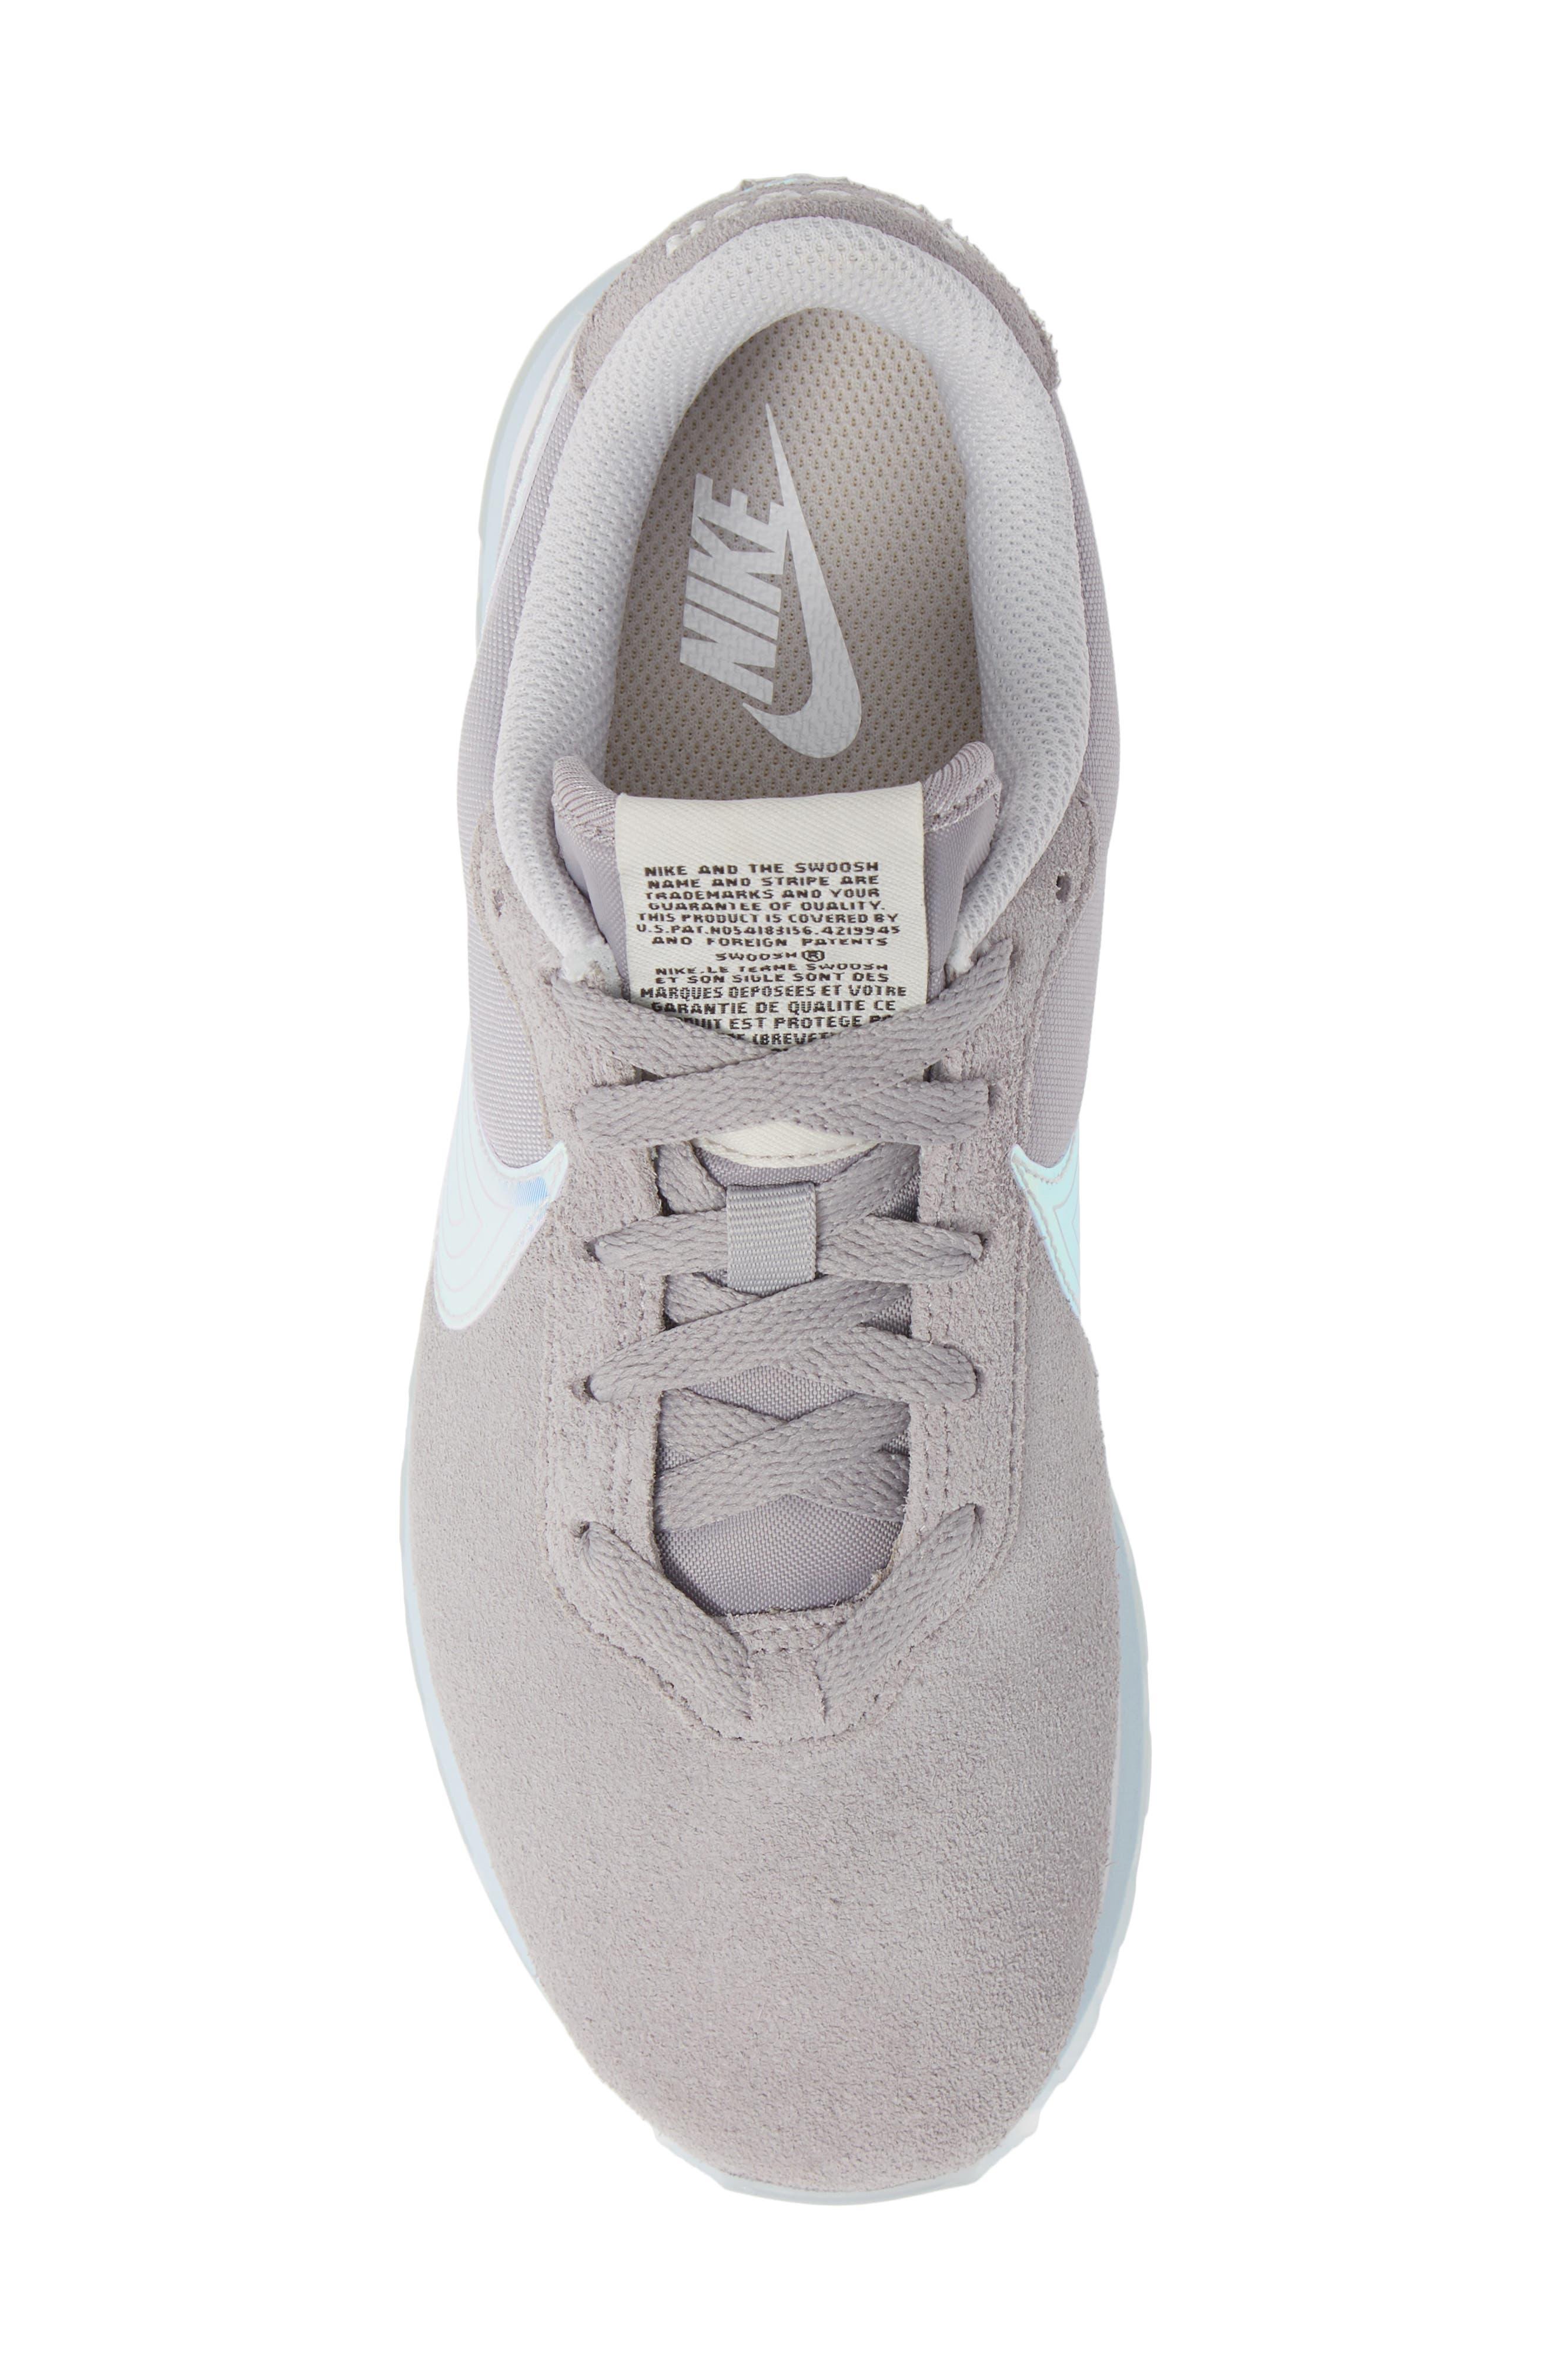 Pre Love O.X. Sneaker,                             Alternate thumbnail 5, color,                             ATMOSPHERE GREY/ WHITE/ GREY